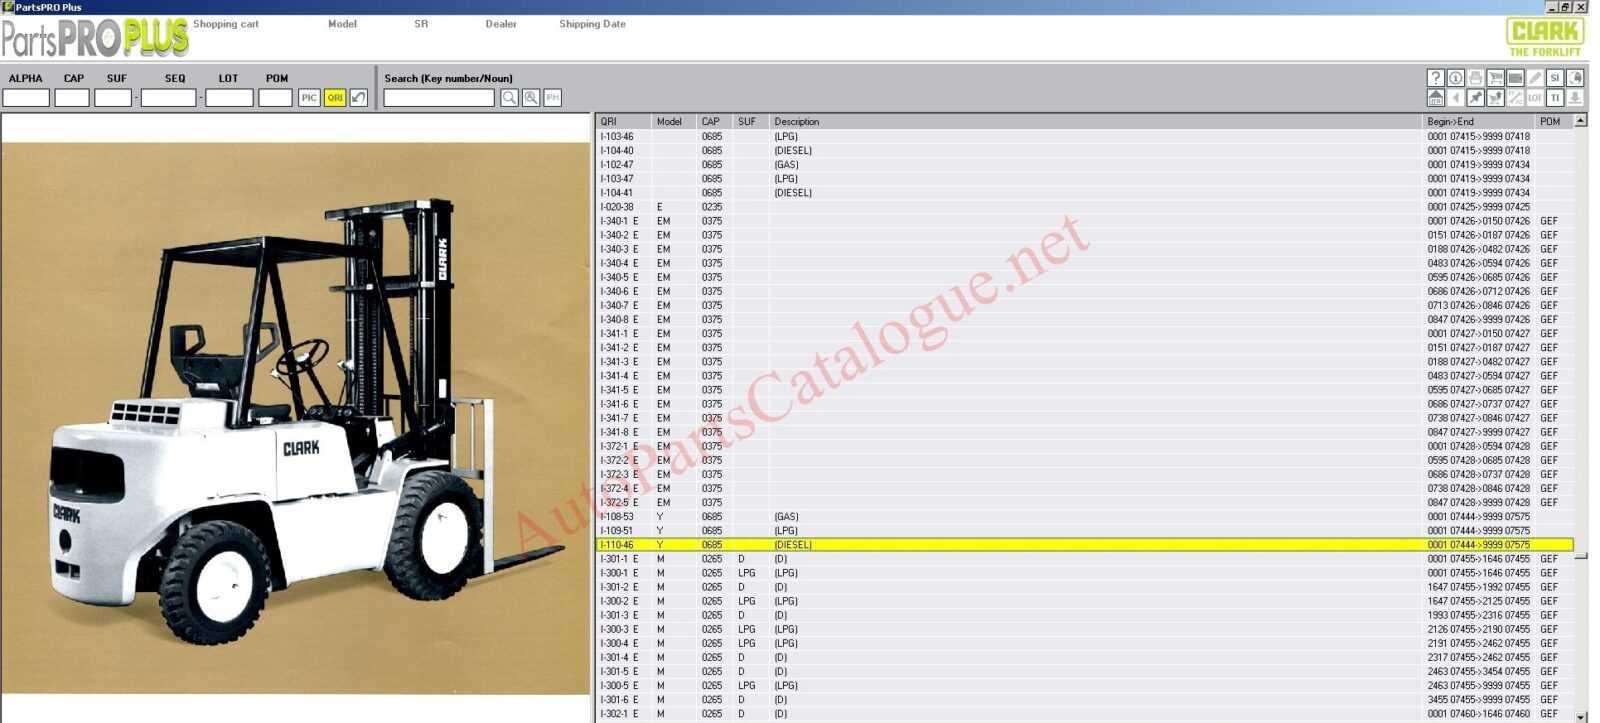 Clark Forklift Trucks PartsProPlus Parts Catalog